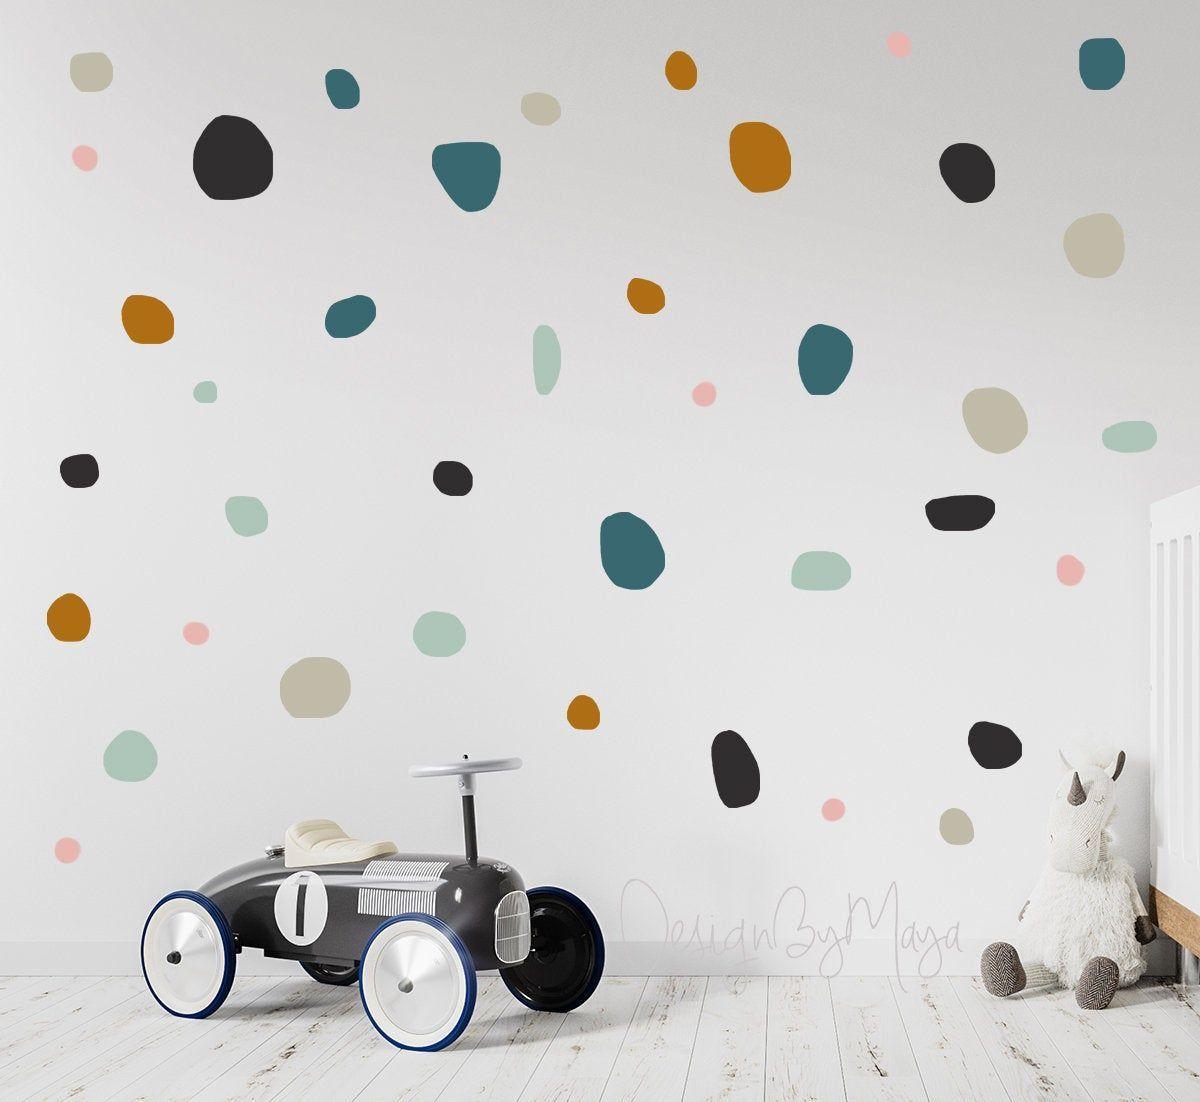 Hand Drawn Polka Dots Baby Nursery Kids Room Wall Decals Kids Nursery Wall Sticker Decor Polka Dot Playroo In 2020 Kids Room Wall Decals Playroom Wall Kids Wall Decals